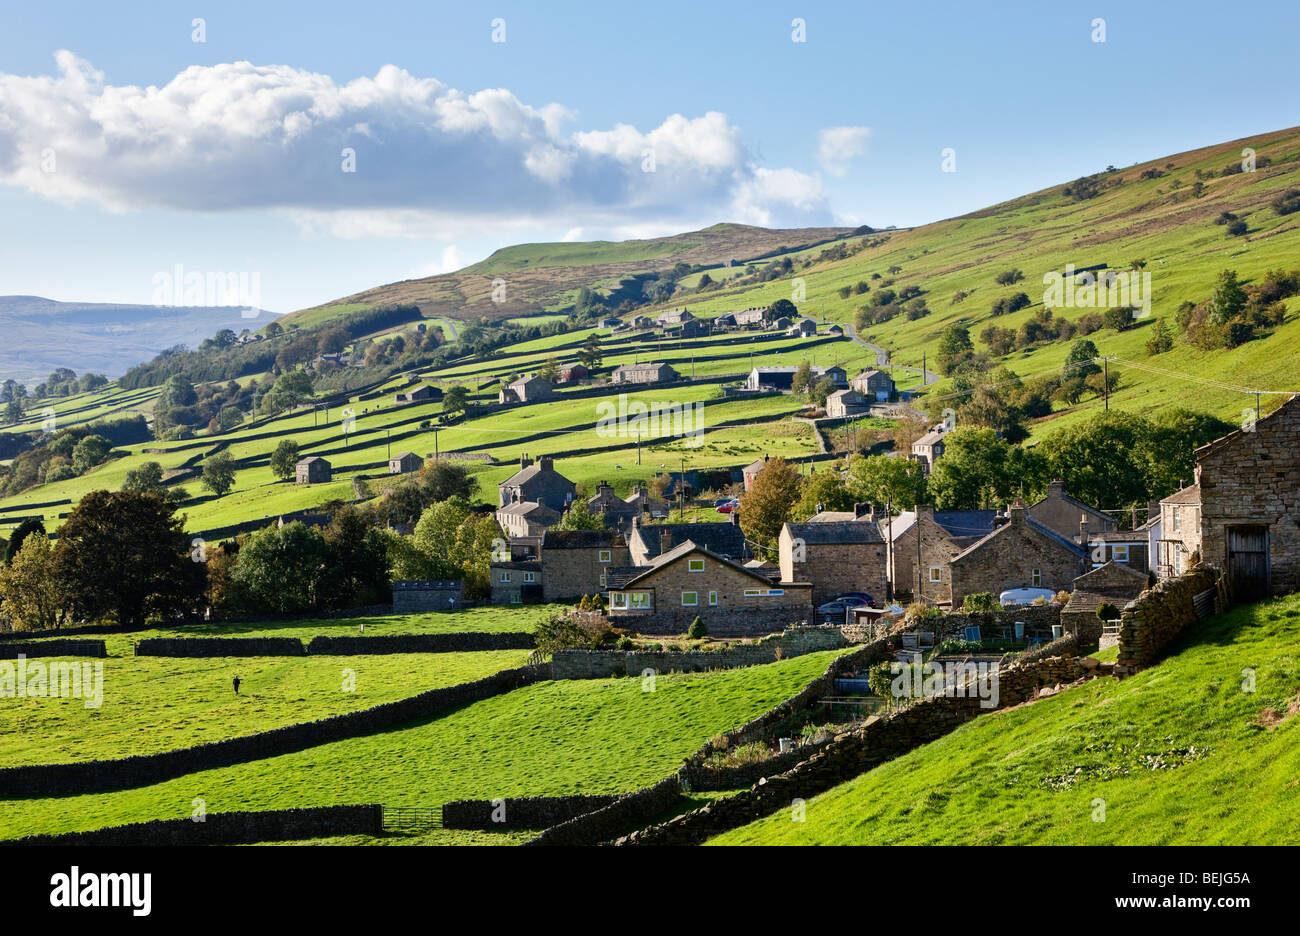 Yorkshire Dales Dorf Gunnerside in Swaledale, England, North Yorkshire, englische Landschaft, Großbritannien Stockbild